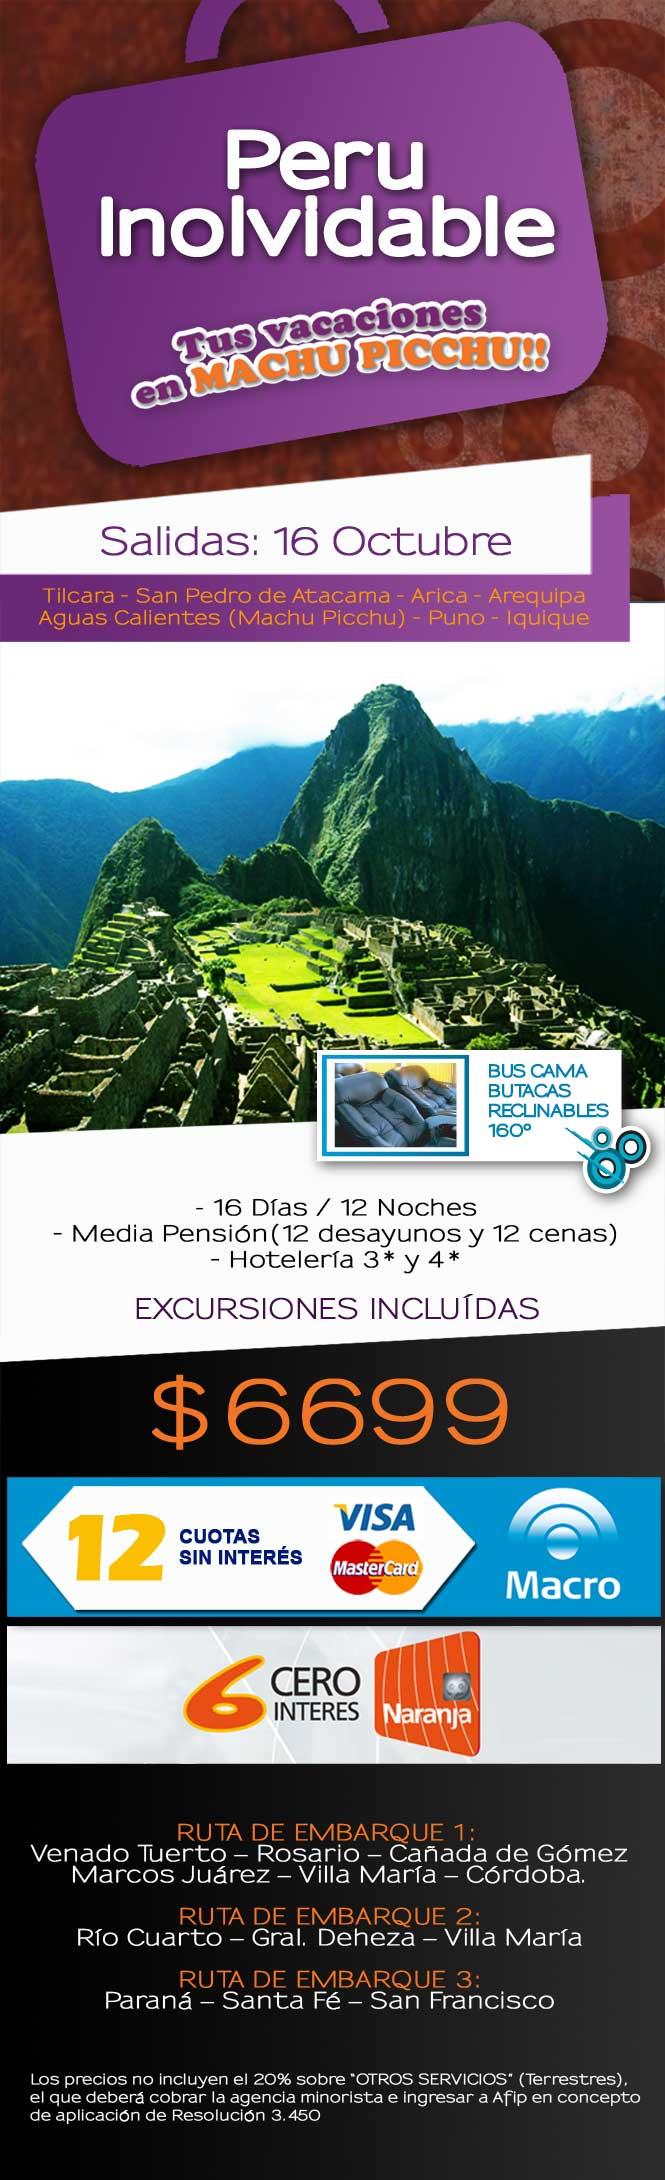 PERU ROLSOL OCT 2013